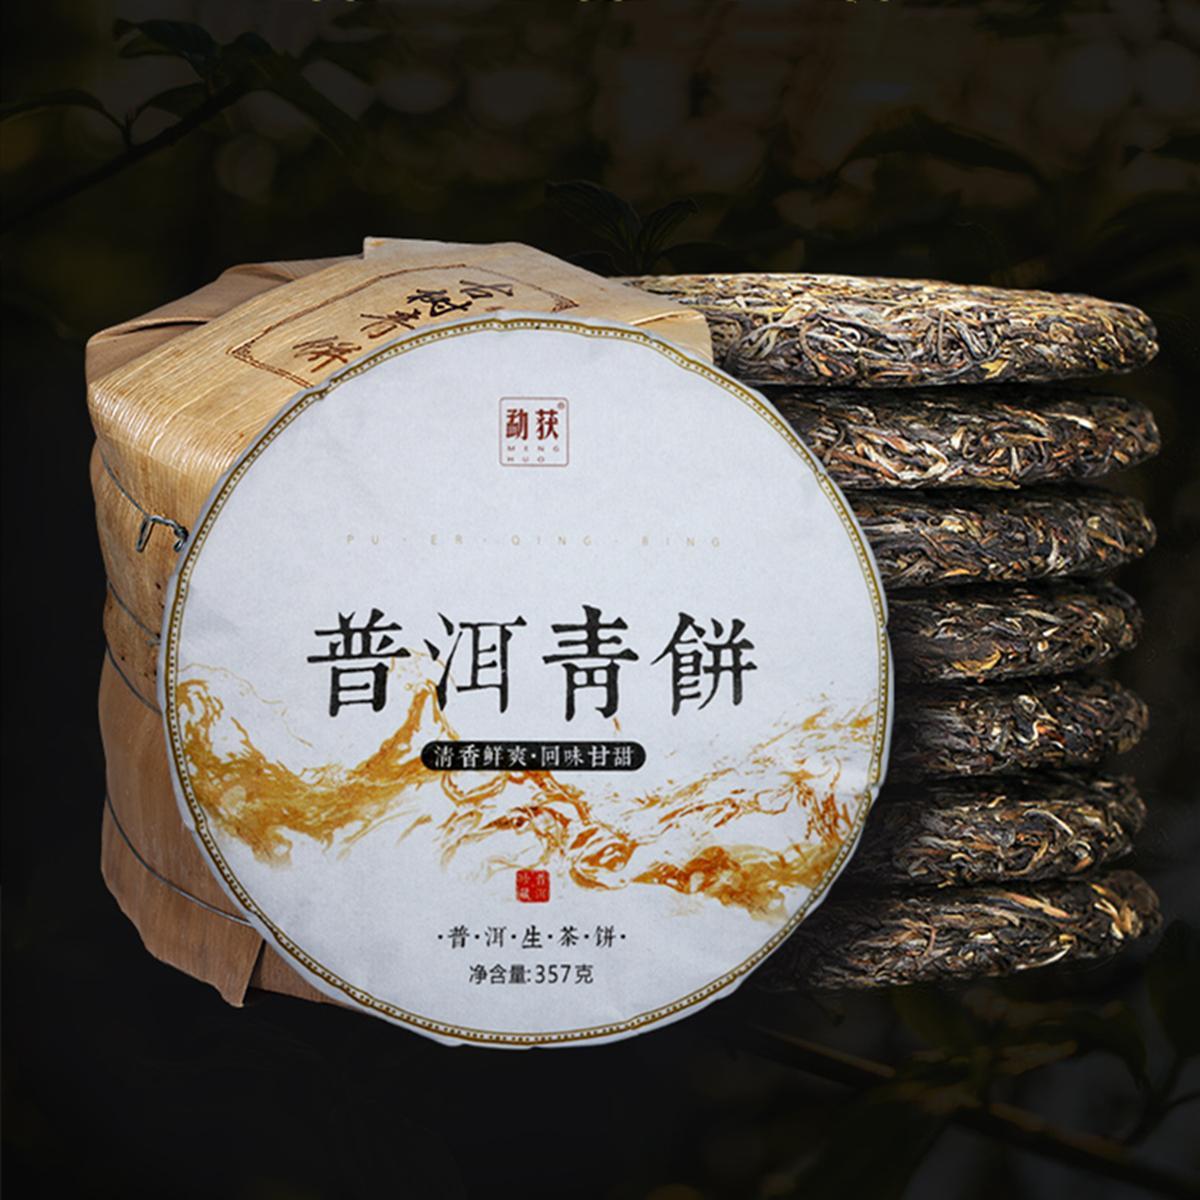 Sıcak satış 357g ham puer çay yunnan antik ağaç yeşil pasta puer çay kek organik doğal pu'er çay en eski ağaç yeşil puer